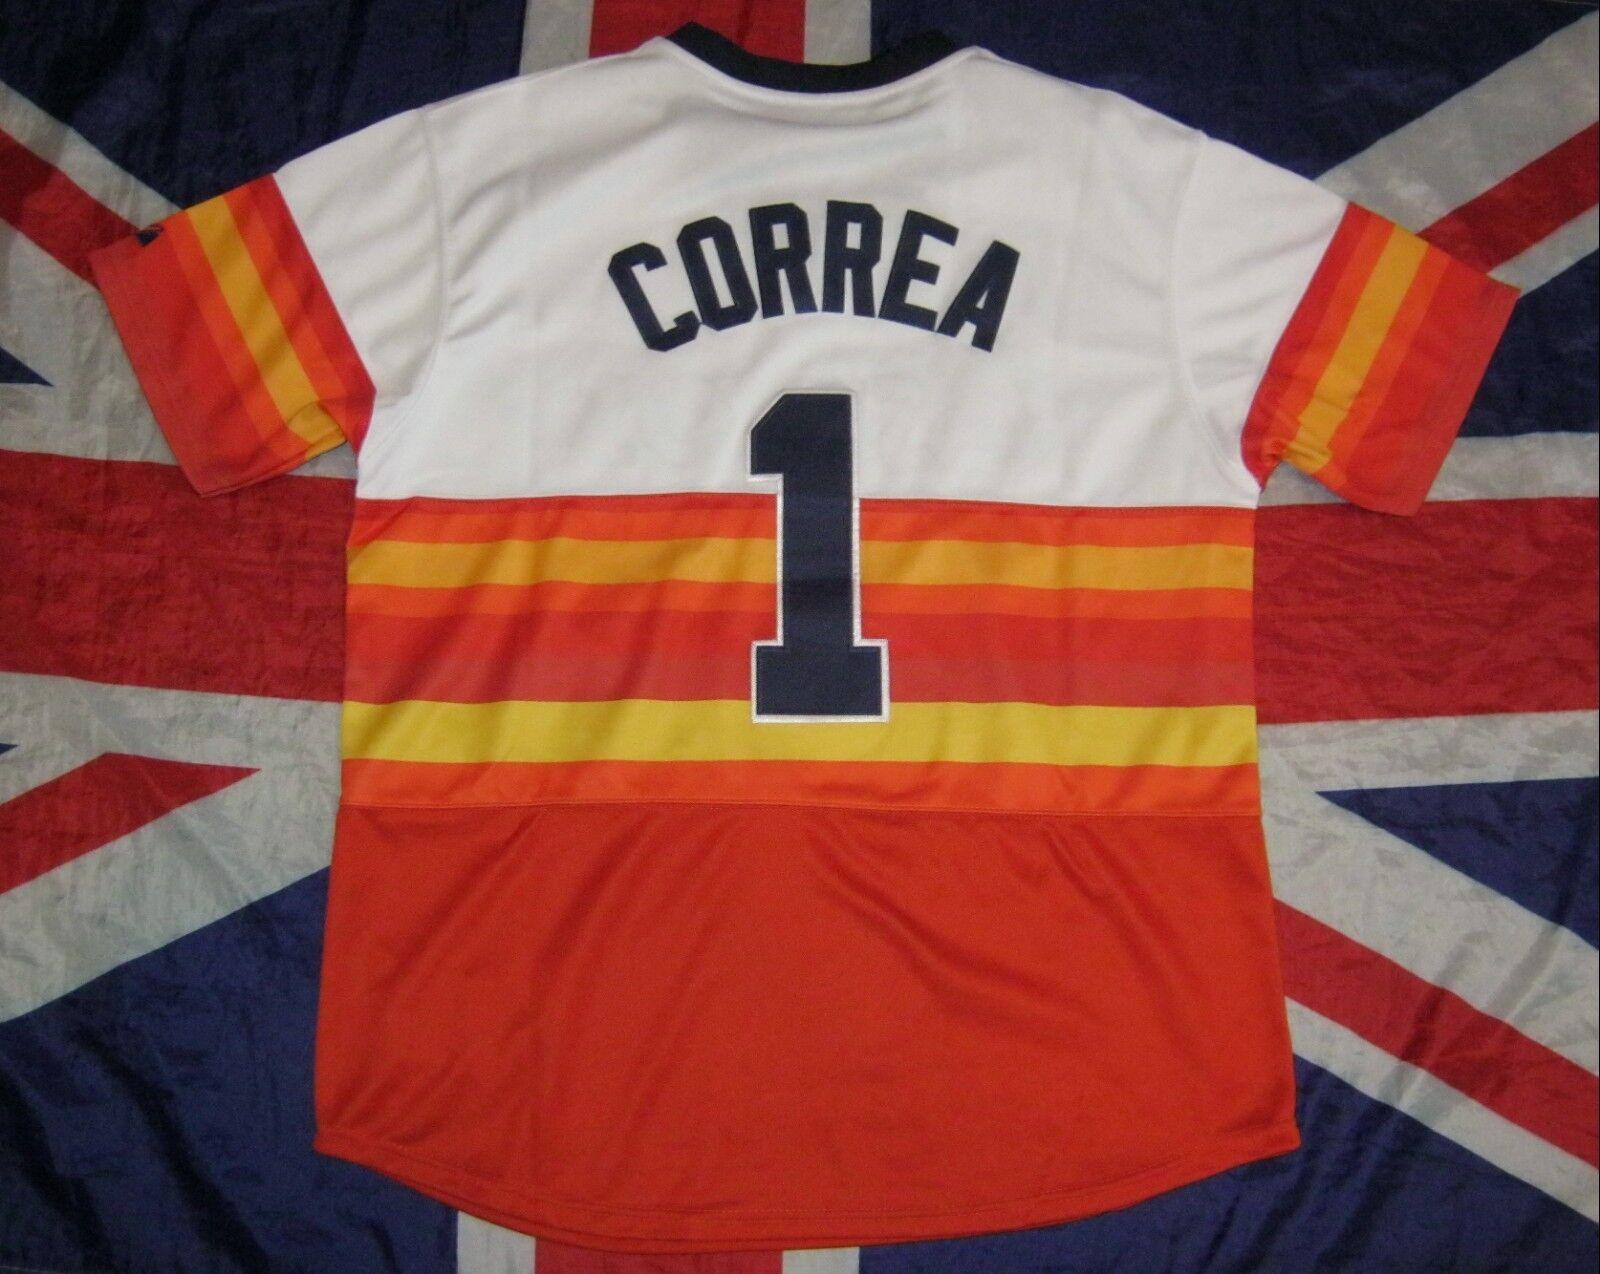 9f07a8c83 Baseball USA Carlos Correa Houston Astros Shirt Jersey Majestic ...